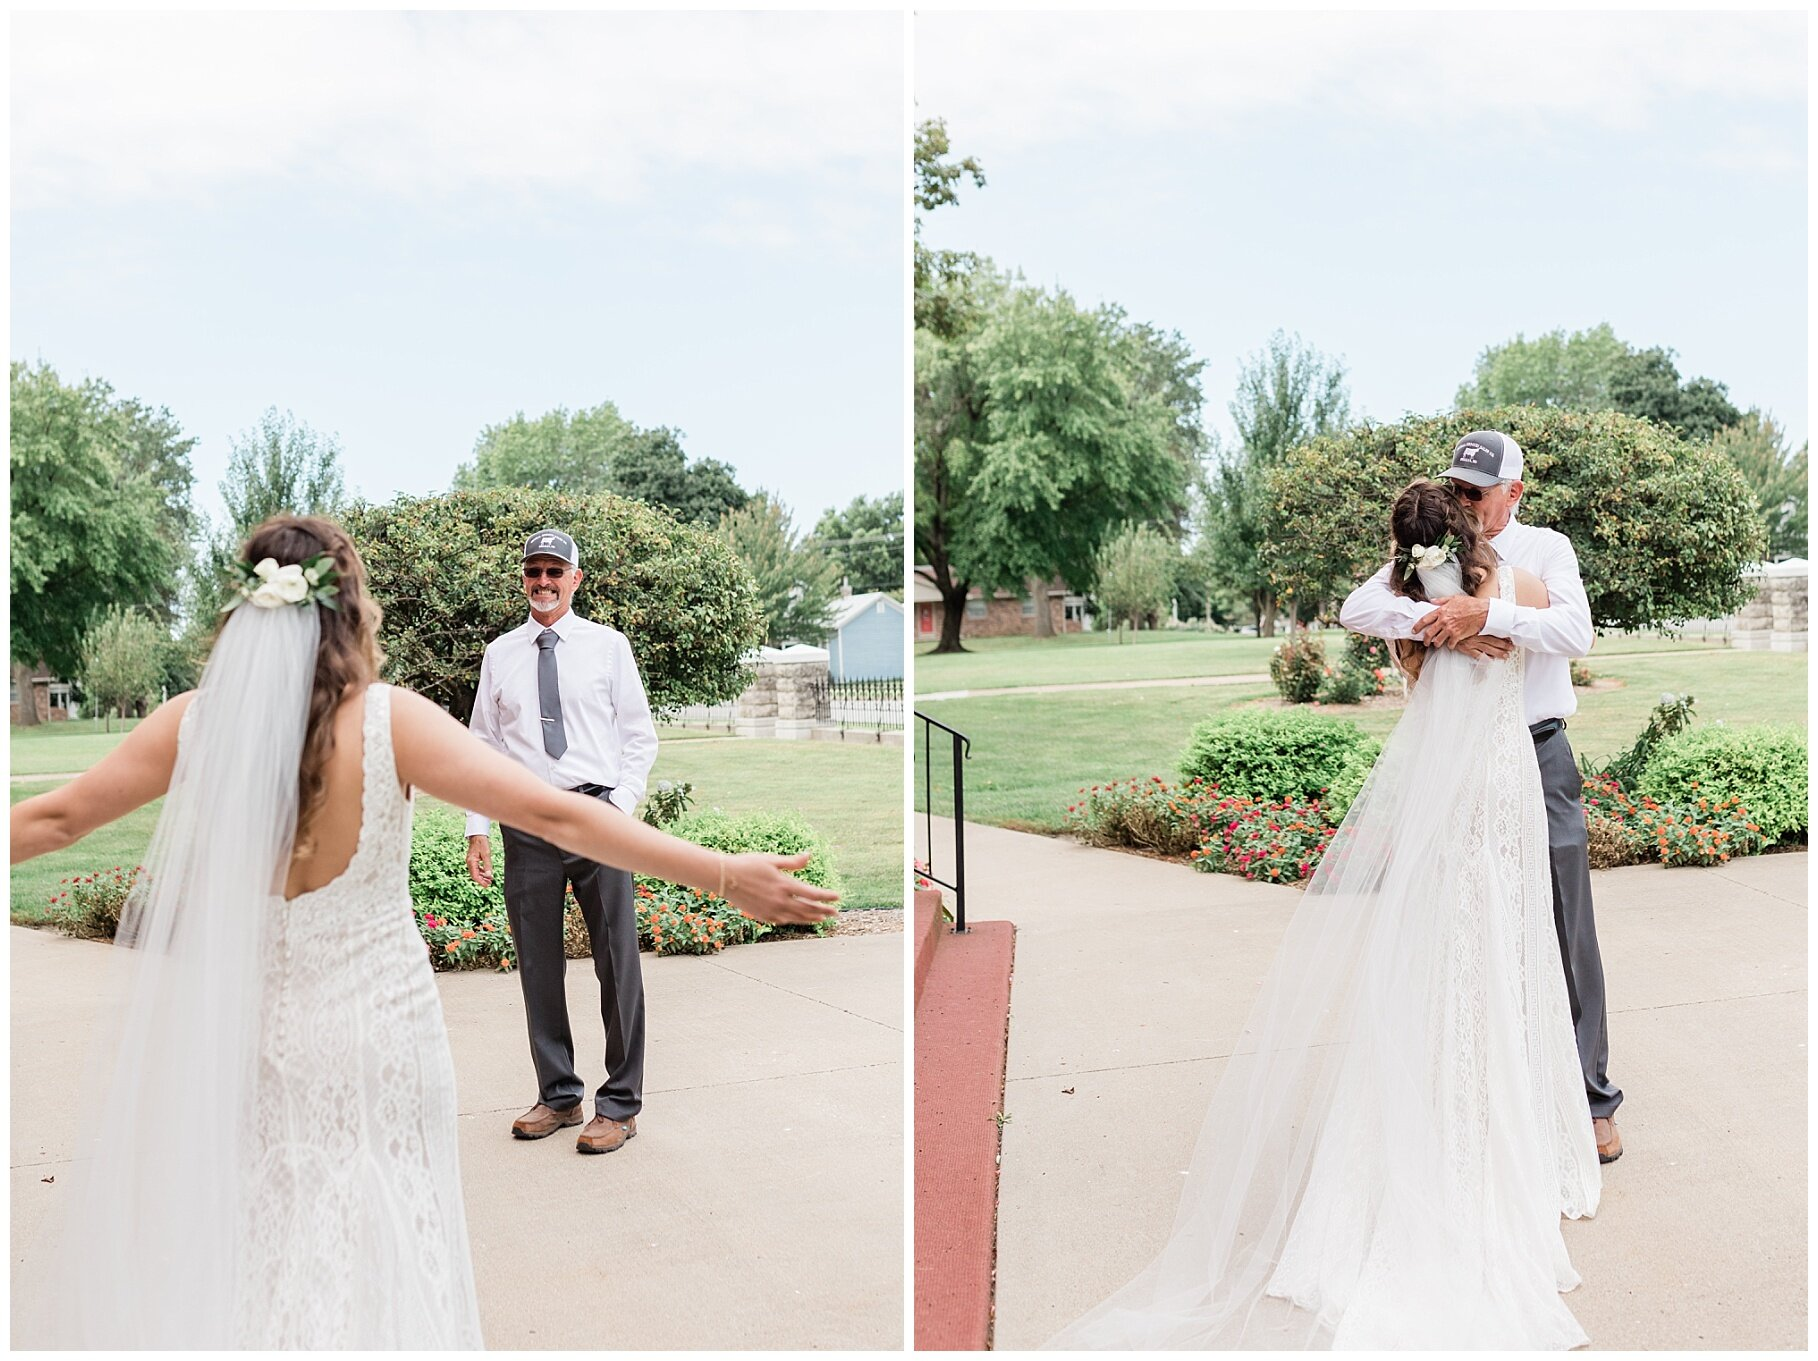 Earth-Toned Wedding by KKP Associate Wedding Photographer and Kelsi Kliethermes Photography Best Columbia Missouri Wedding Photographer_0026.jpg